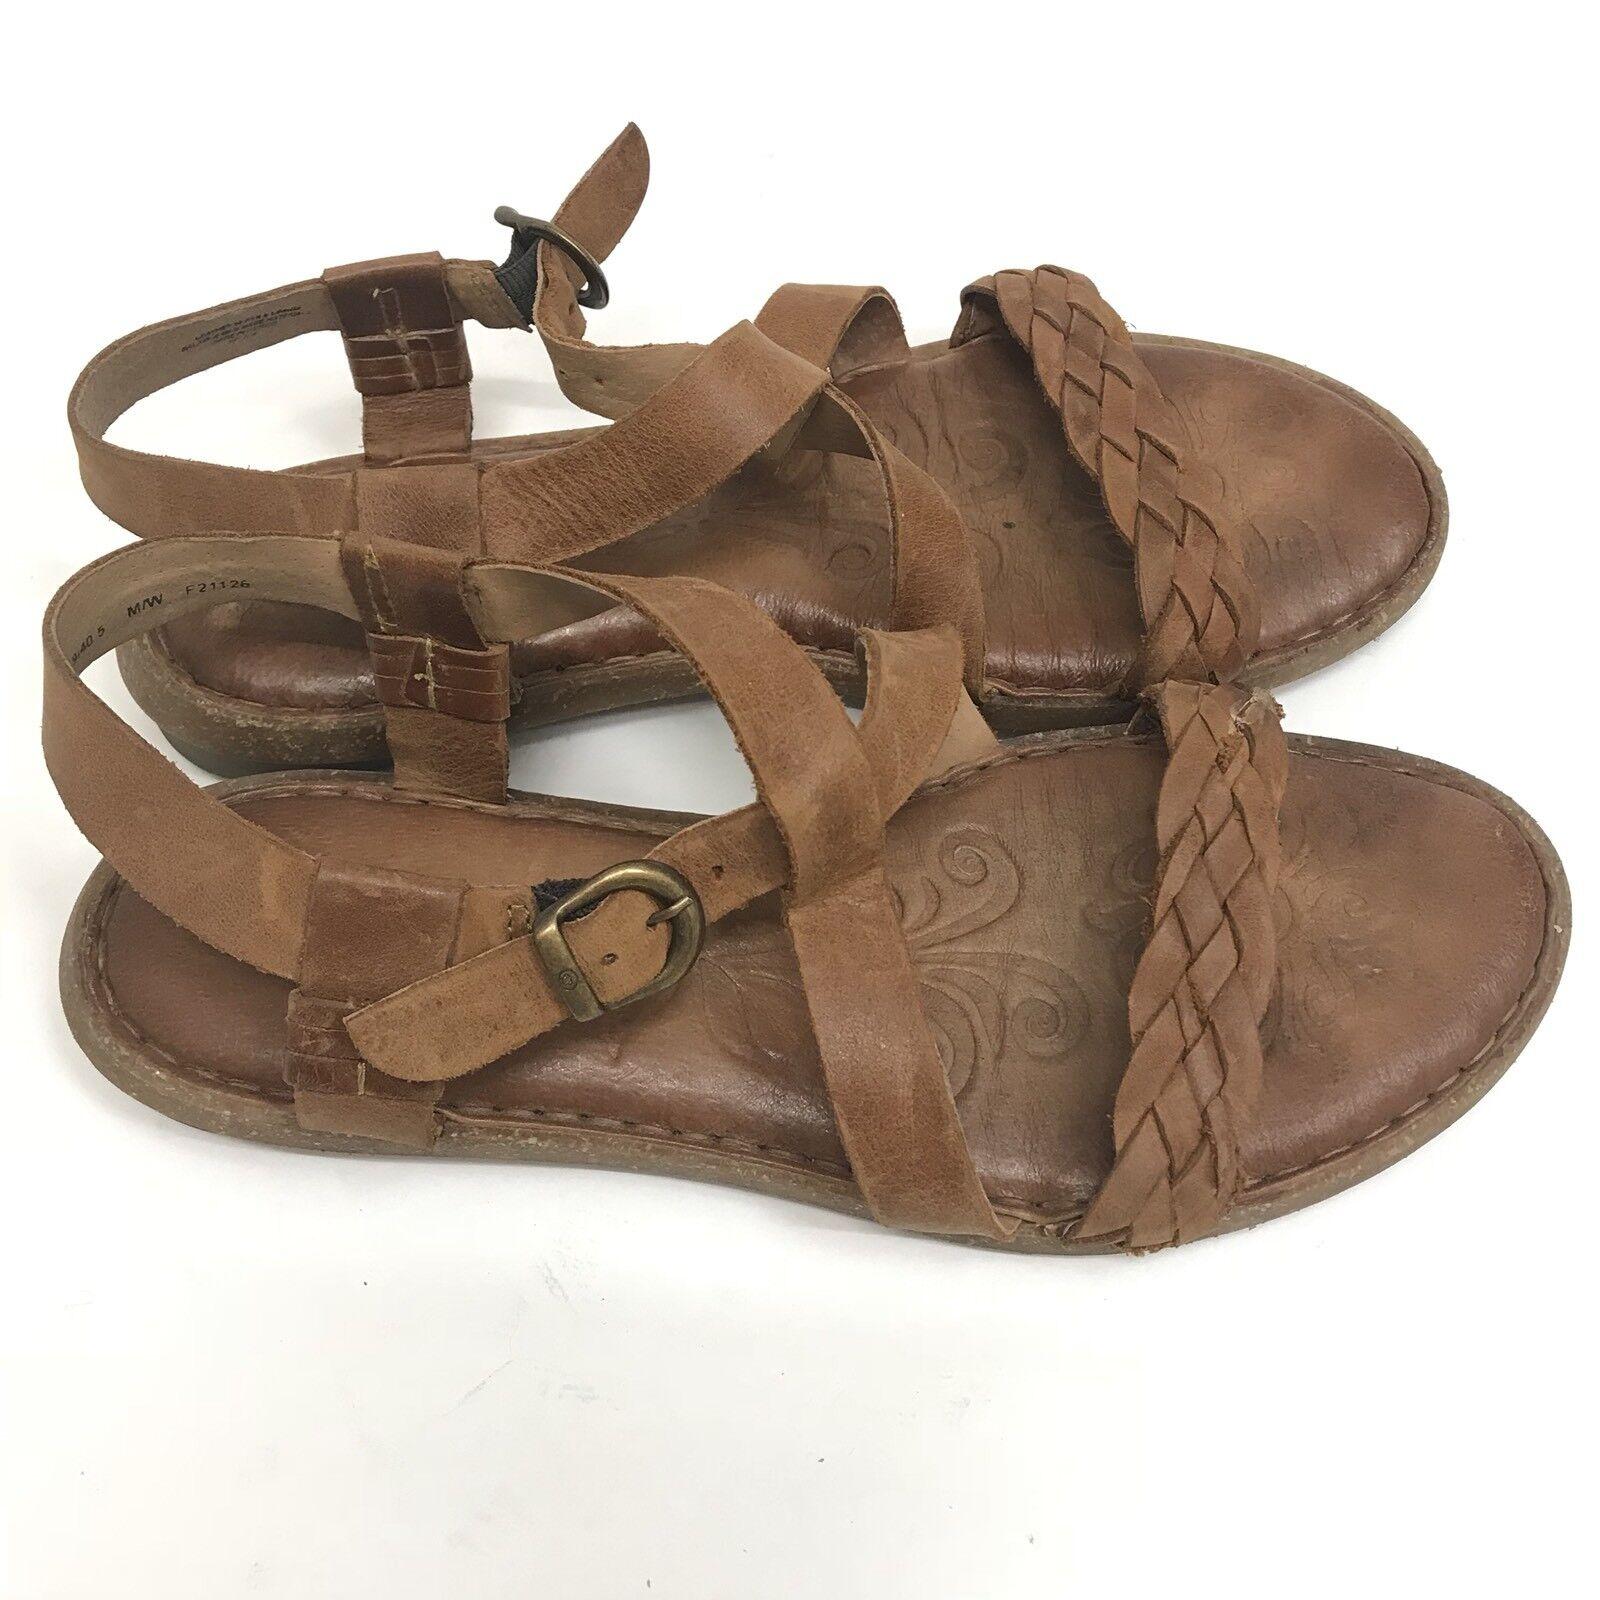 e0177ec9aba Born Womens Sandals Leather Strappy Comfort Flat Open Toe Size 9 US ...